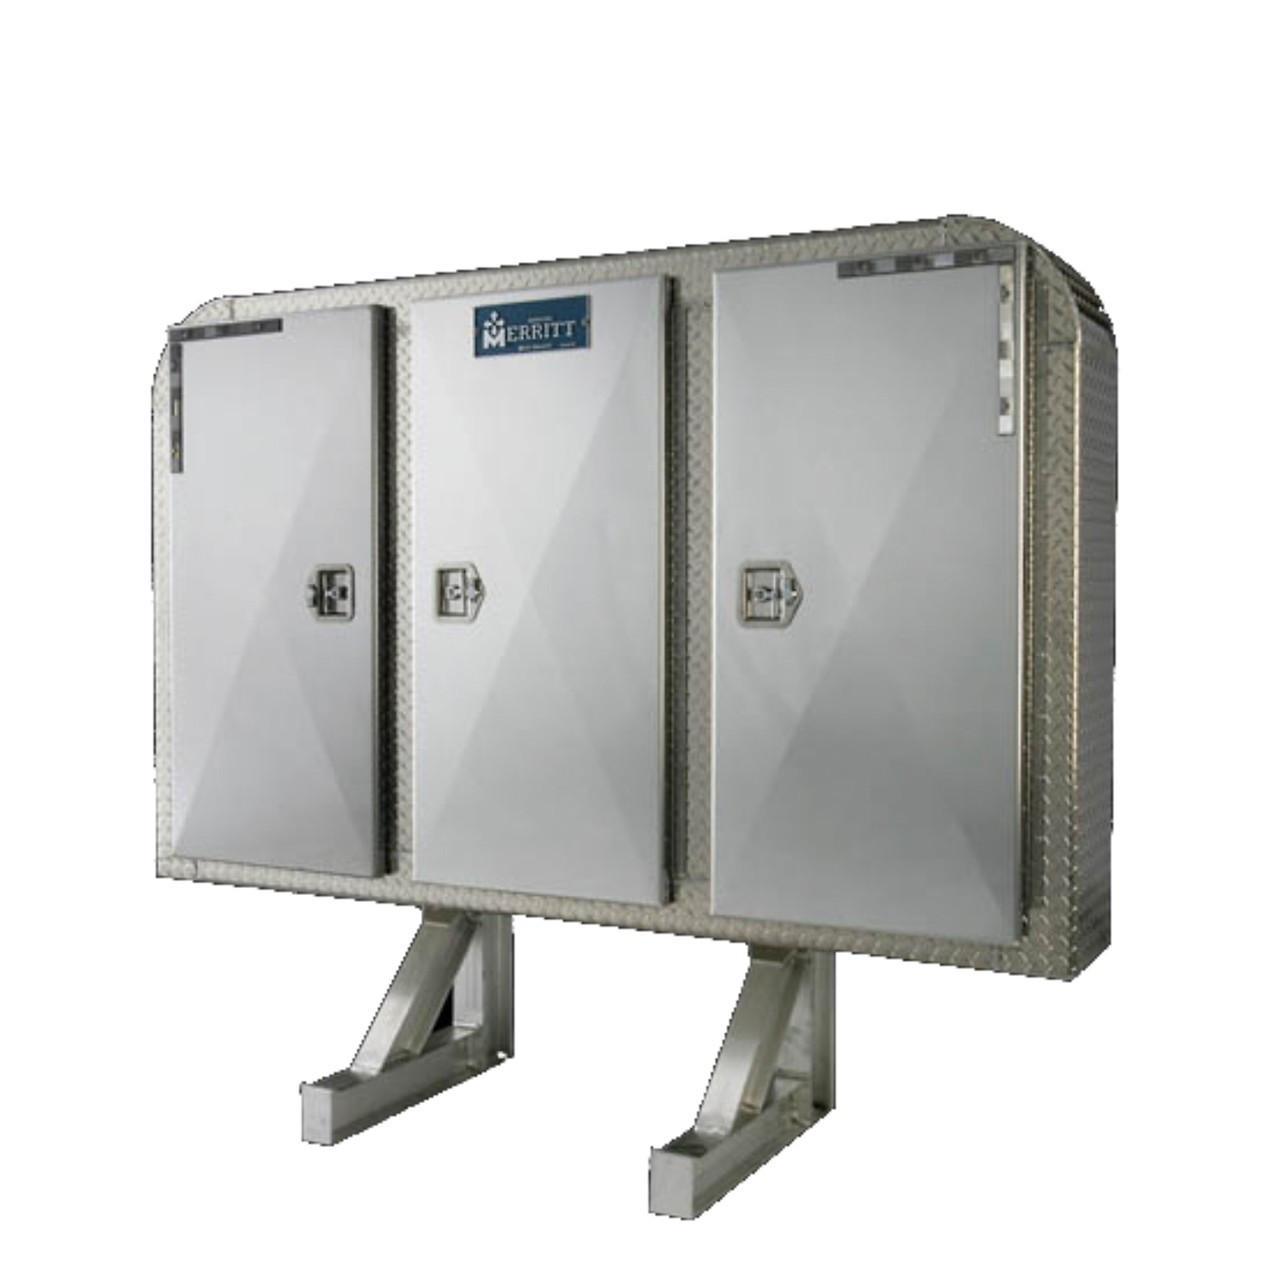 merritt lsr headache rack 3 door full enclosure